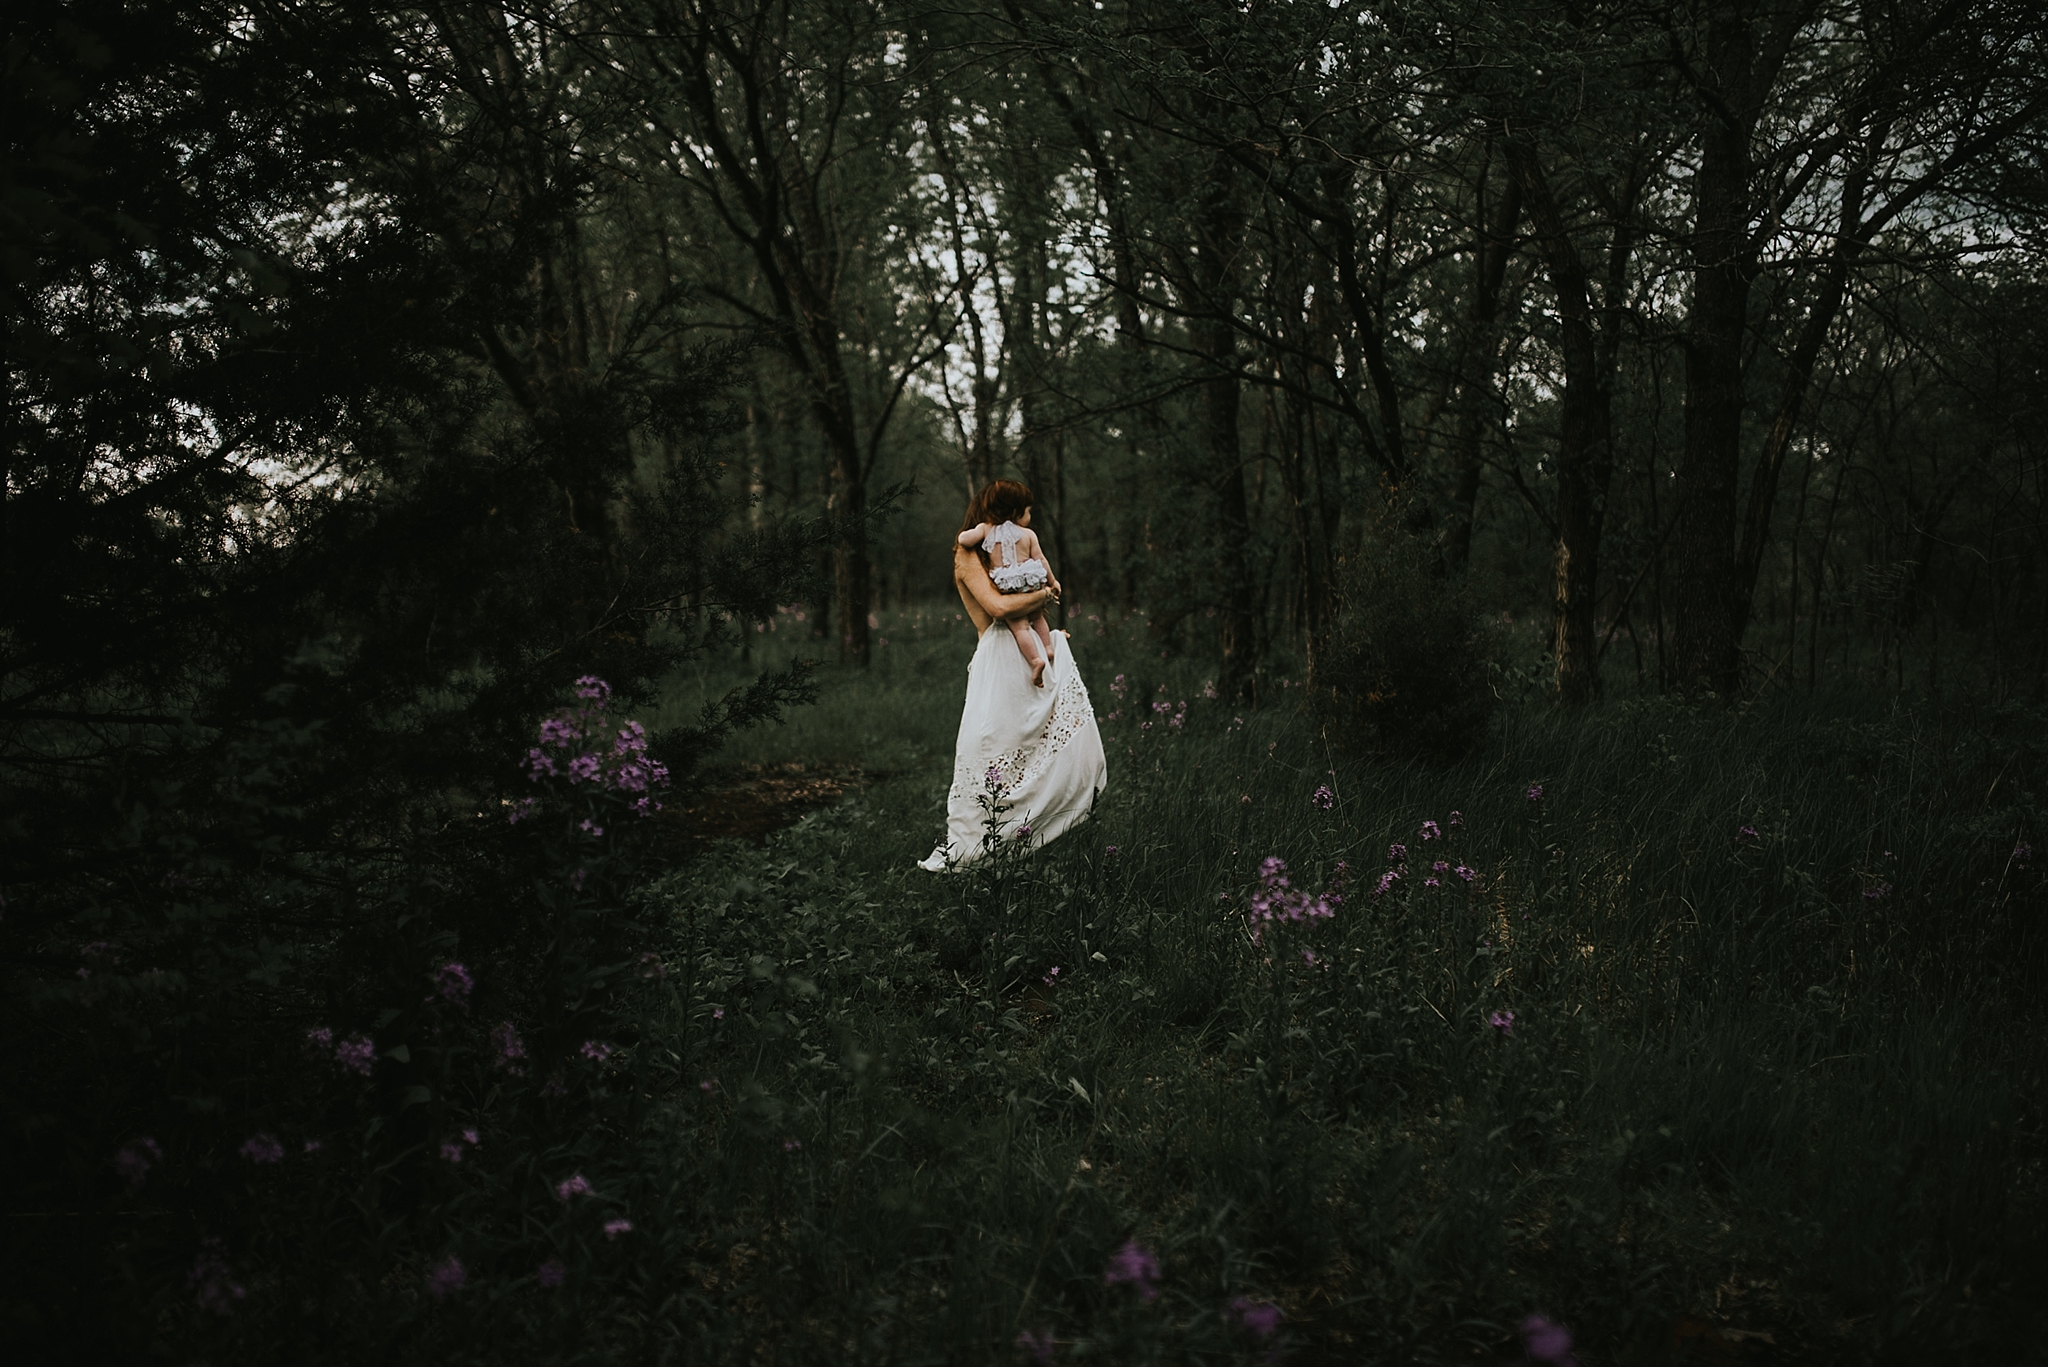 twyla jones photography - mother daughter - field and forest-4668_treasure coast florida.jpg